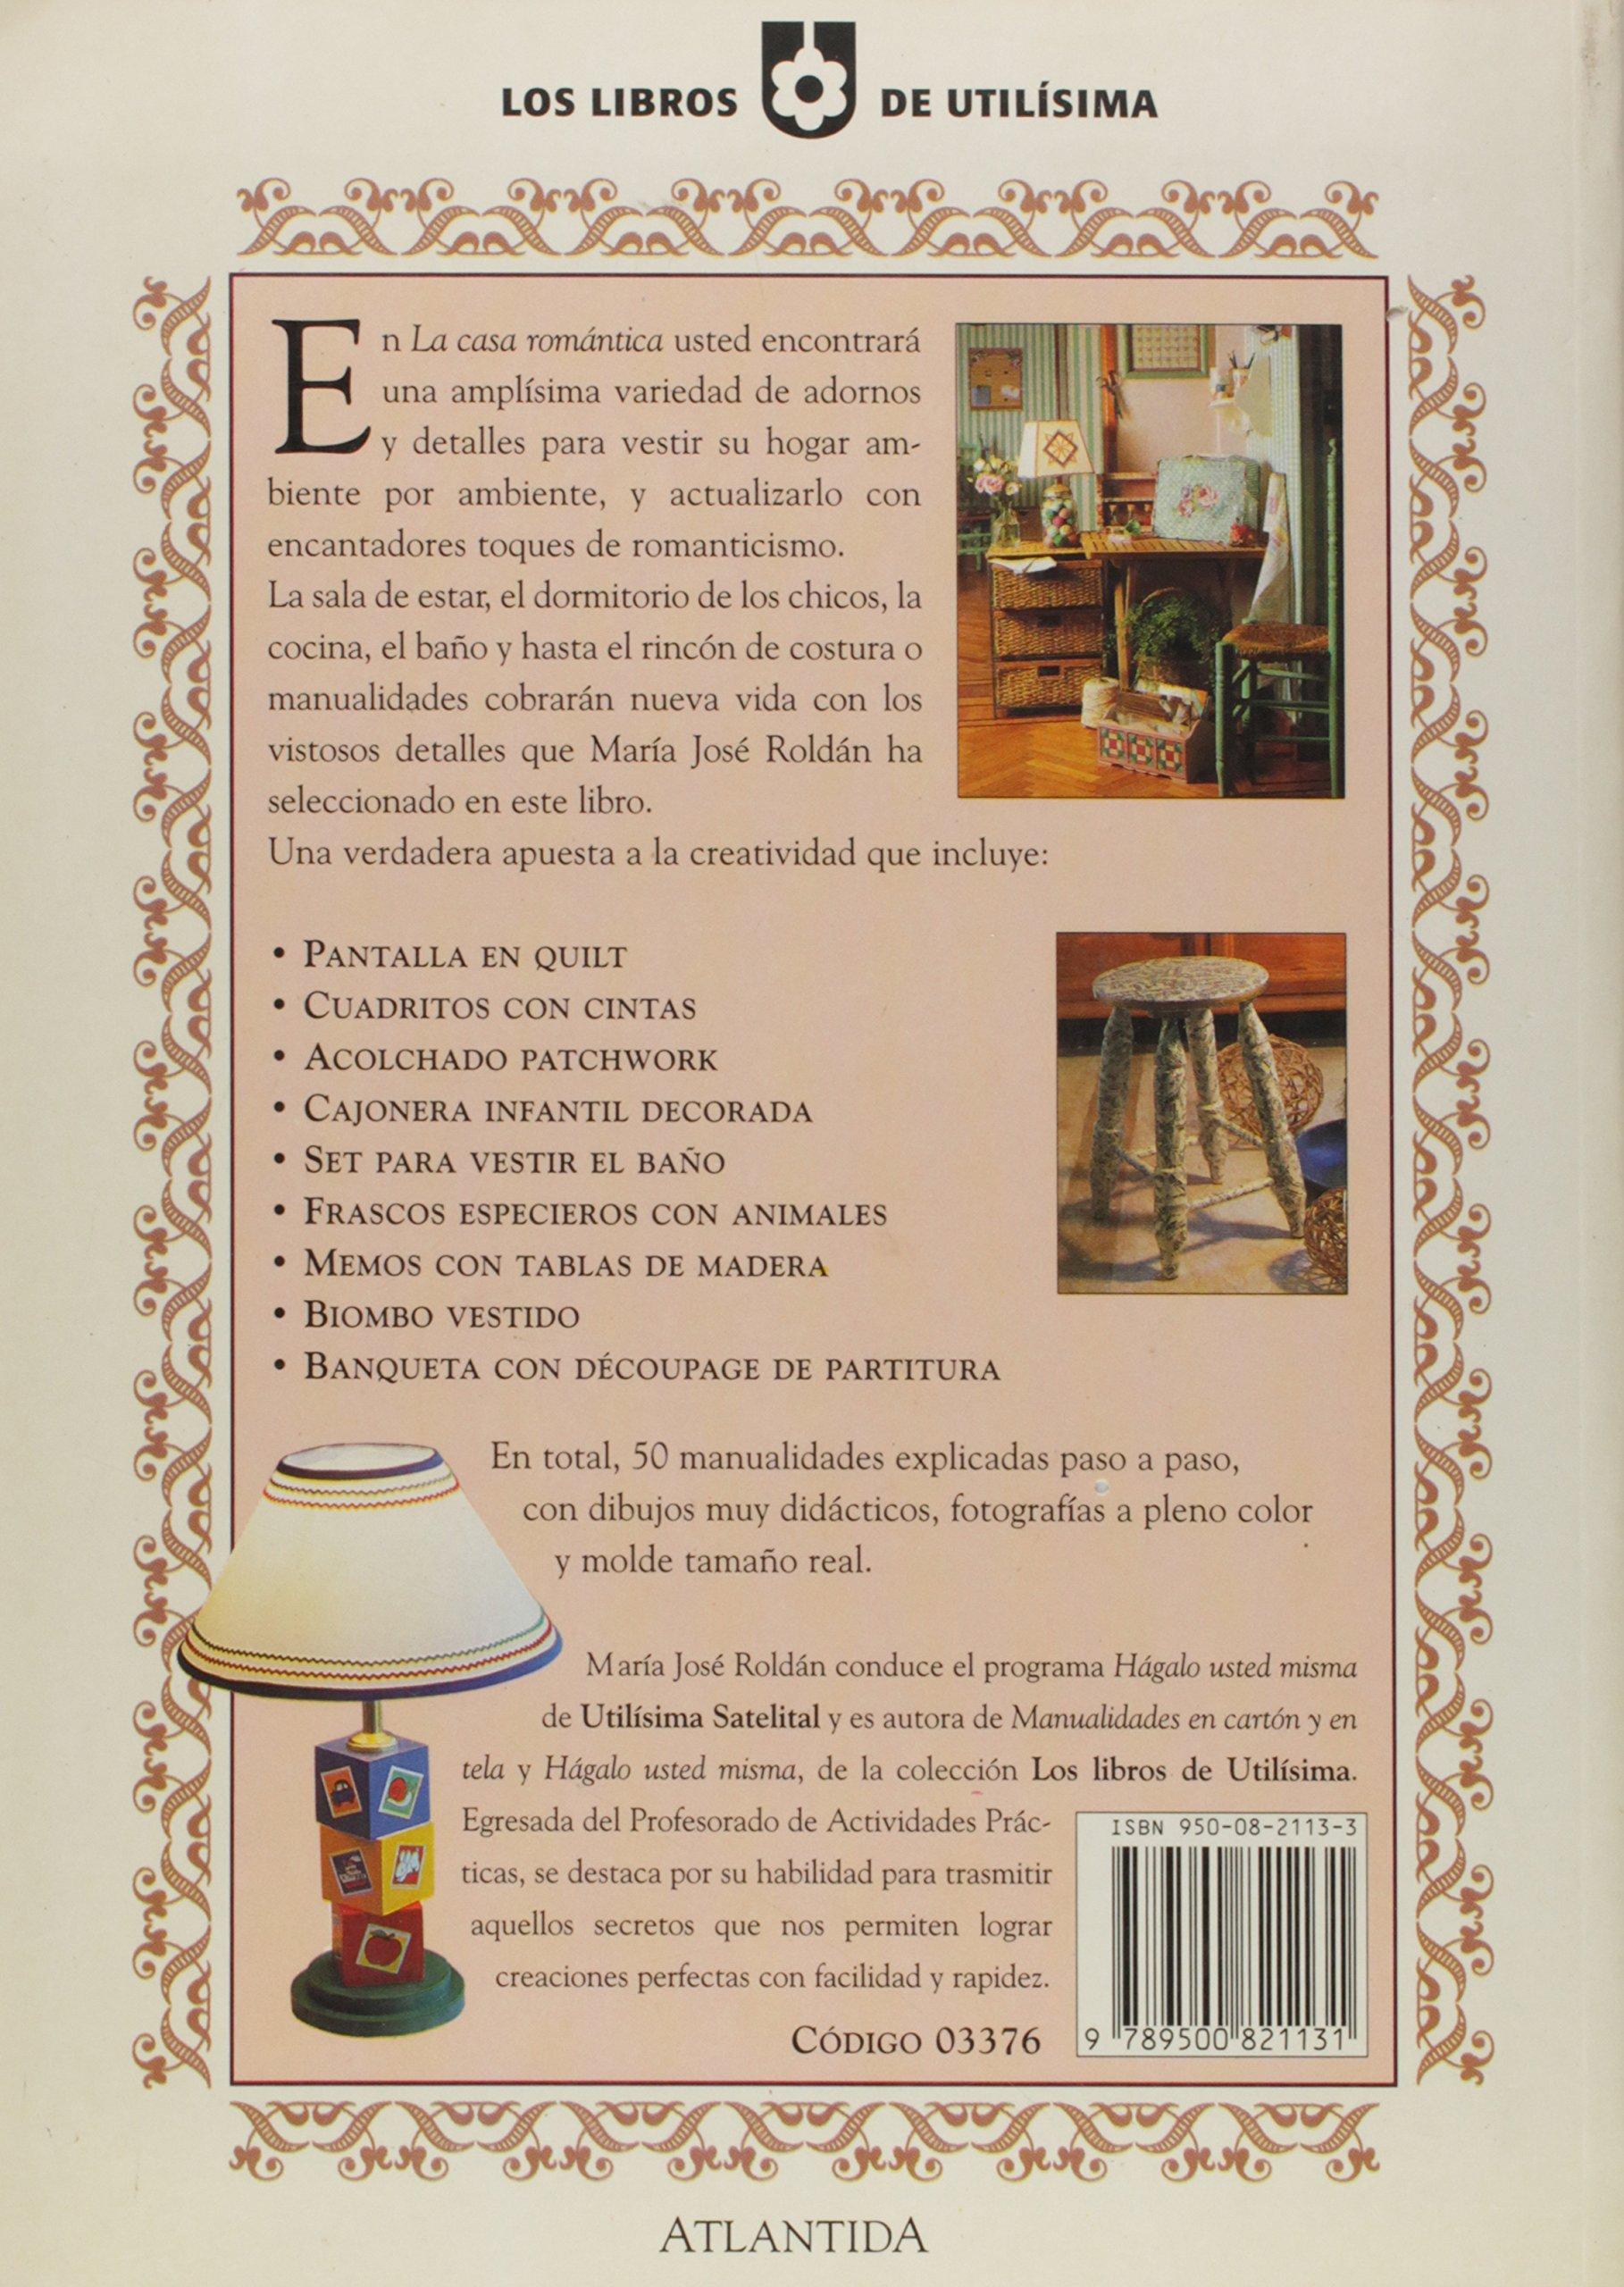 La casa romántica: A. Westgate, Jose Maria Roldan: 9789500821131: Amazon.com: Books